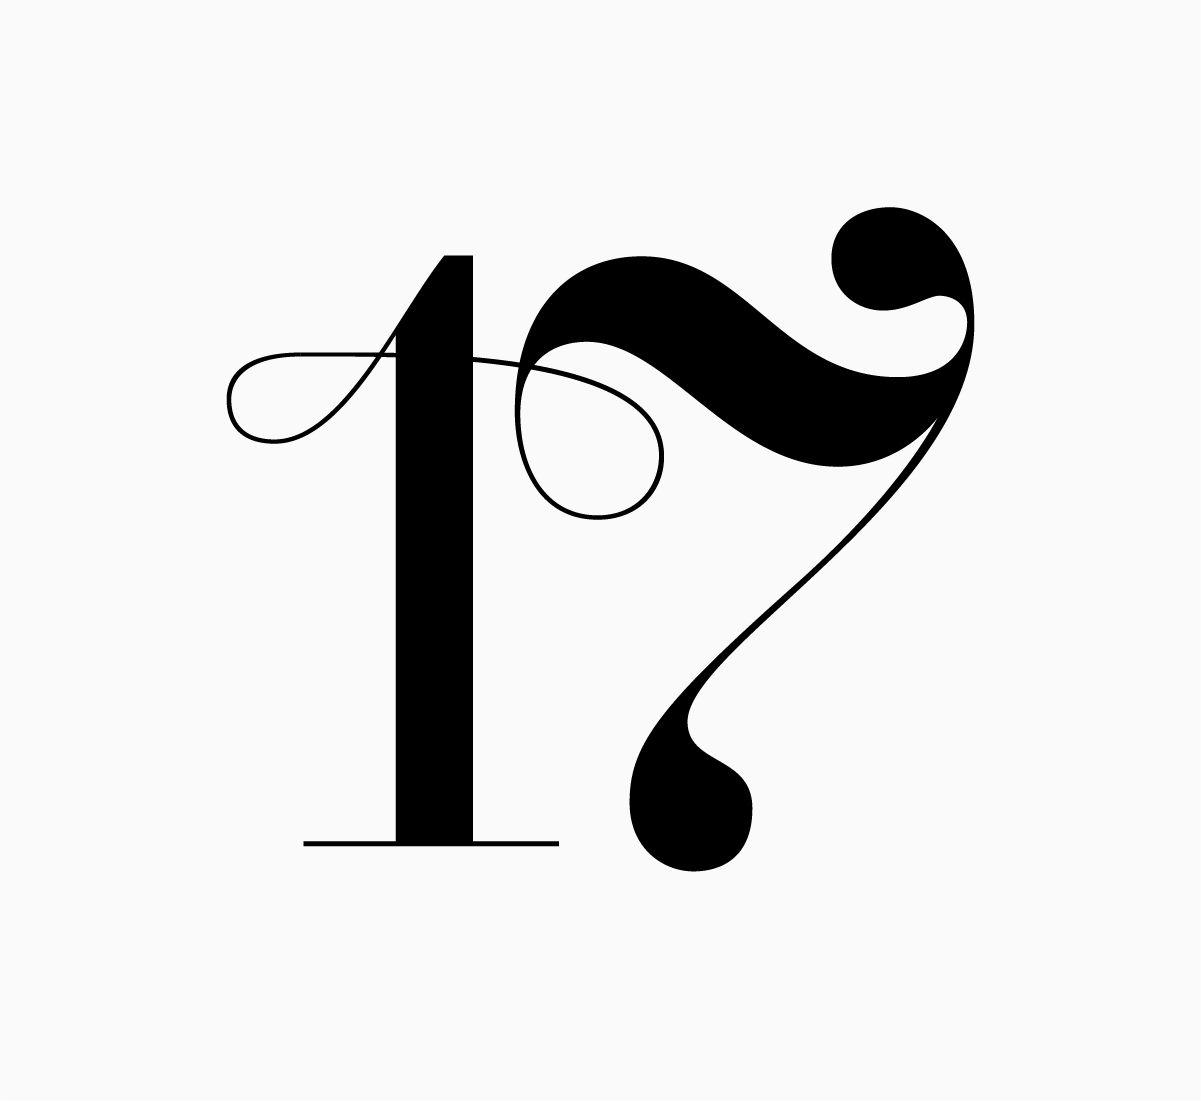 Pin by vanessa moya on typography pinterest typography design